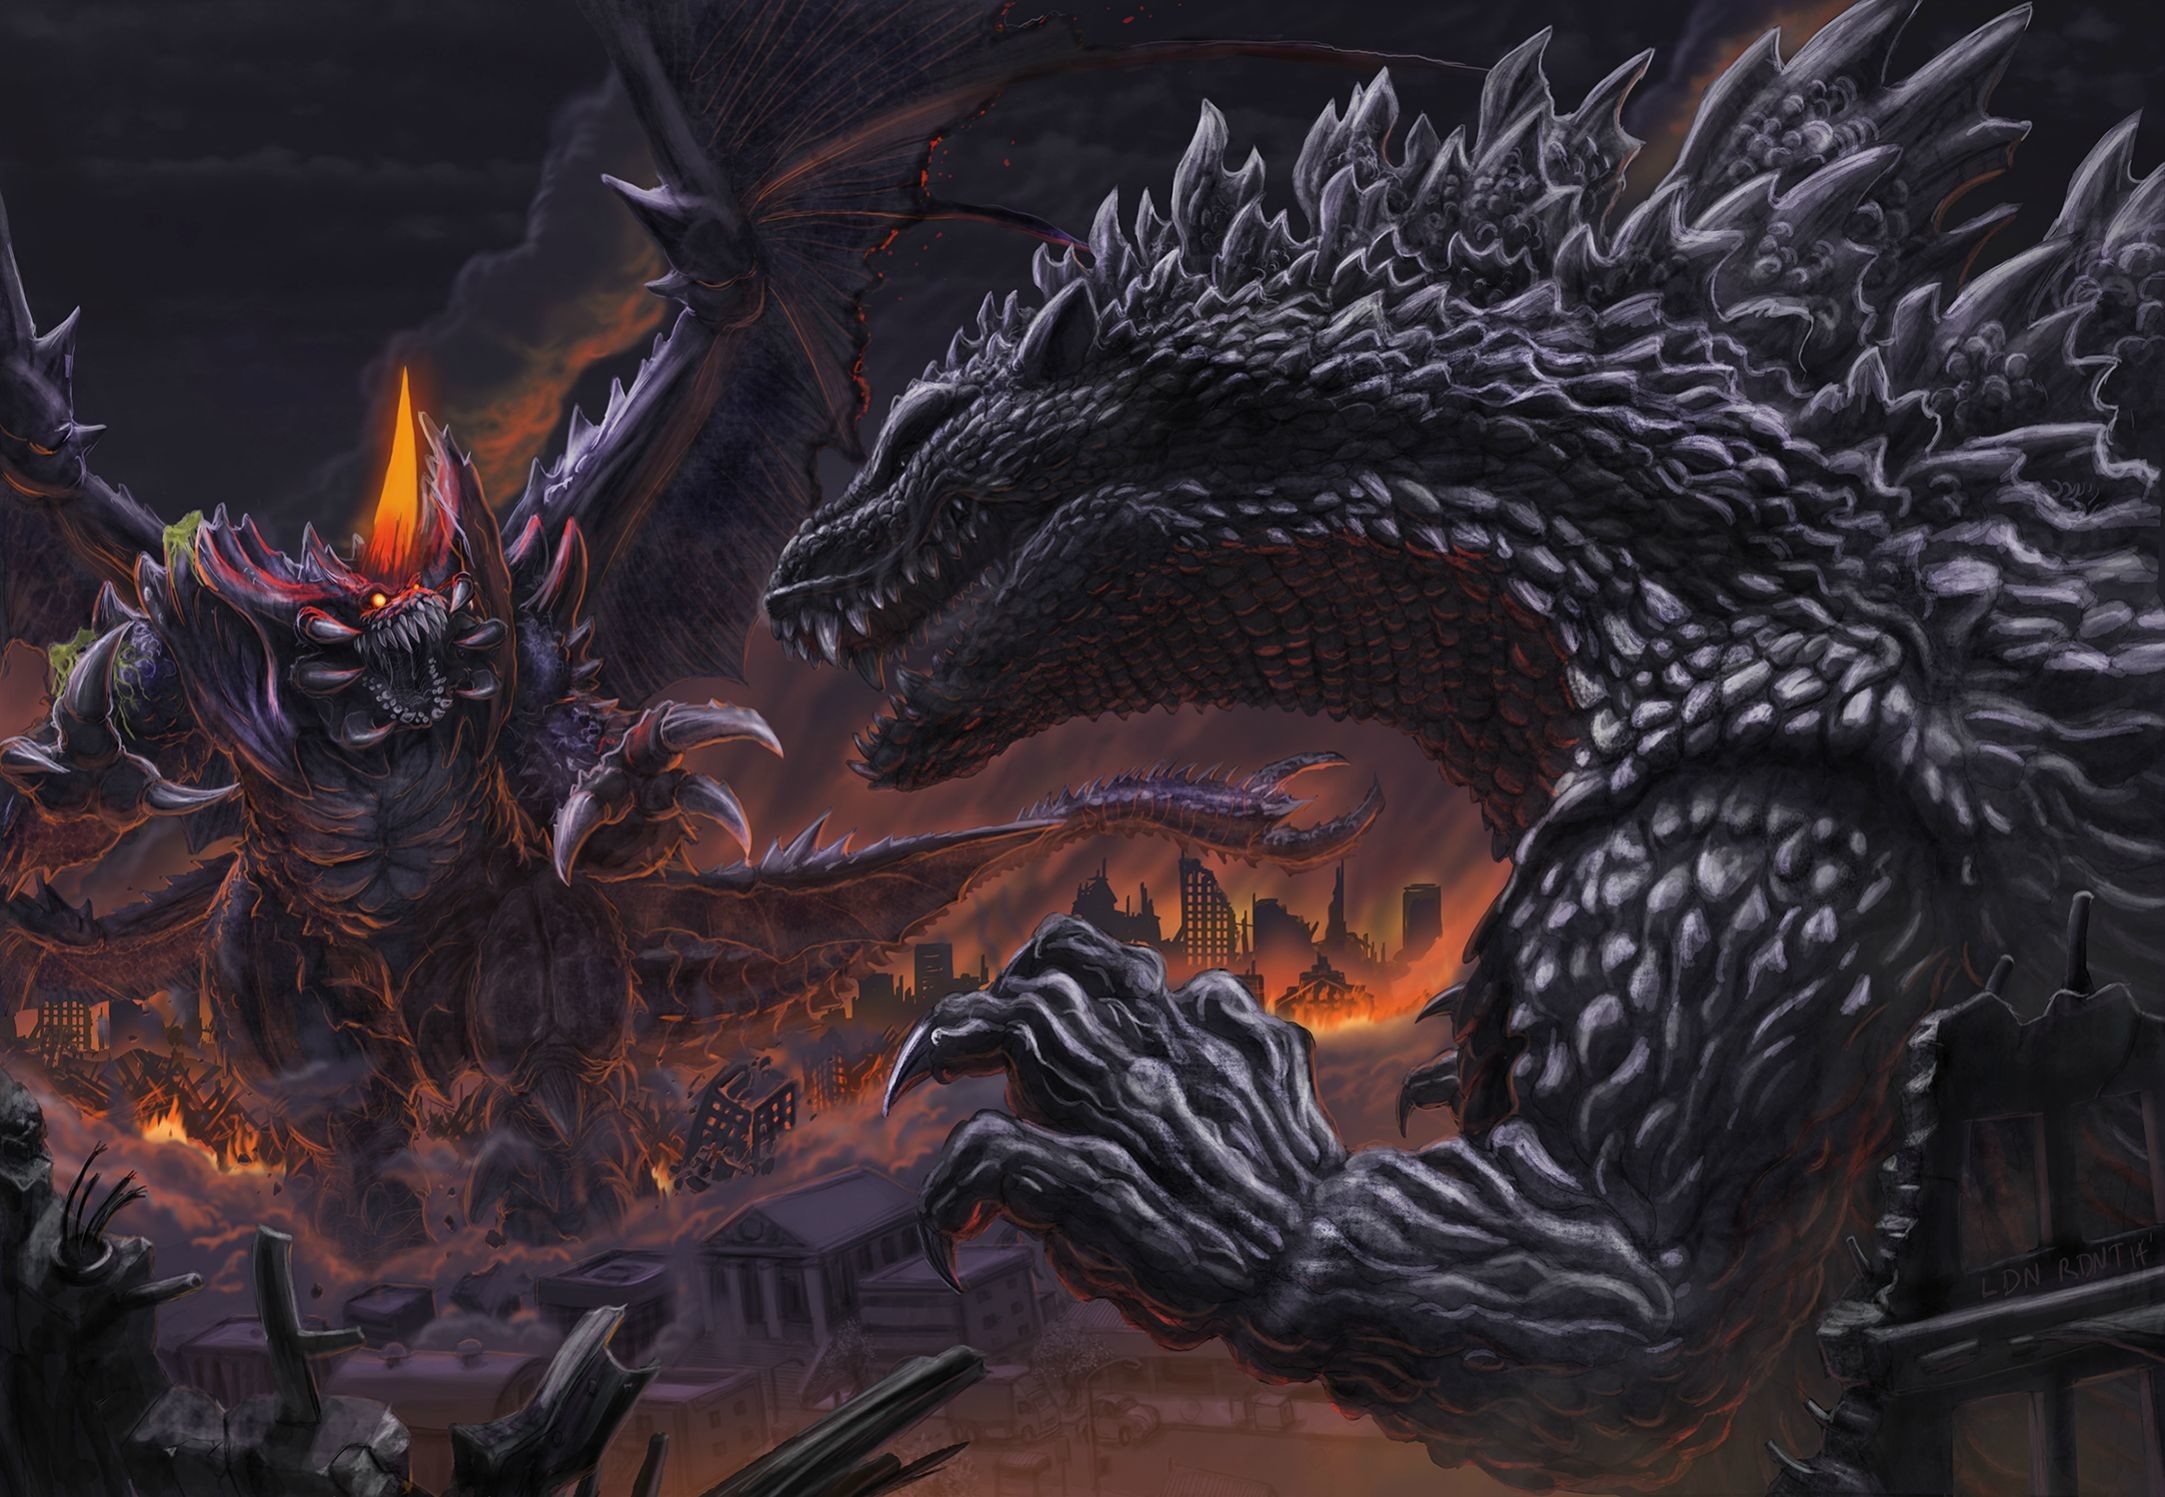 Movie Godzilla Wallpapers X | HD Wallpapers | Pinterest | Godzilla, Hd  wallpaper and Wallpaper